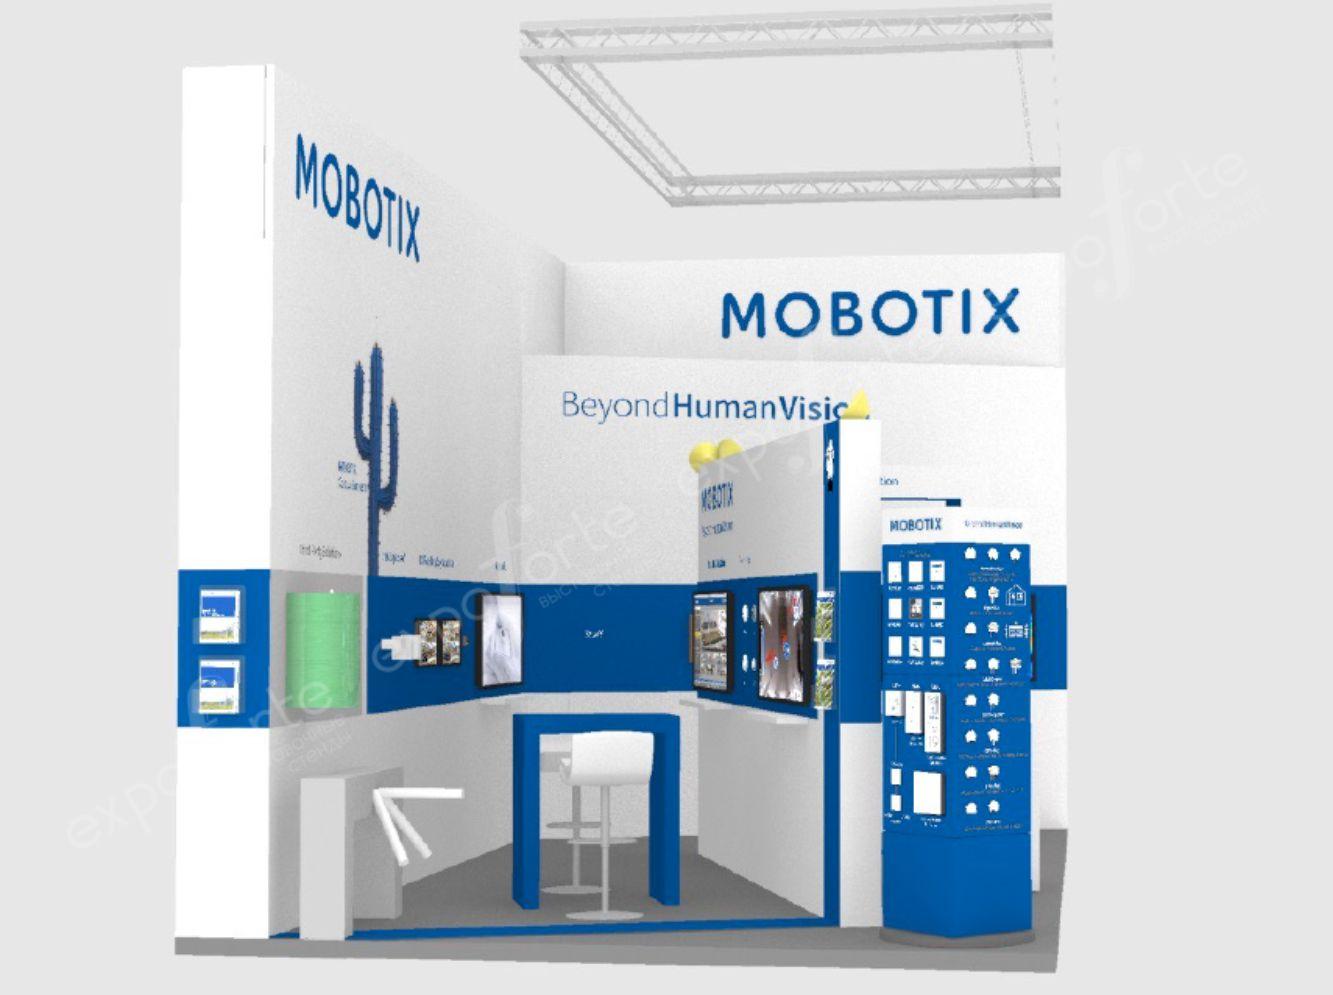 Фото: MOBOTIX, выставка MIPS – картинка 2